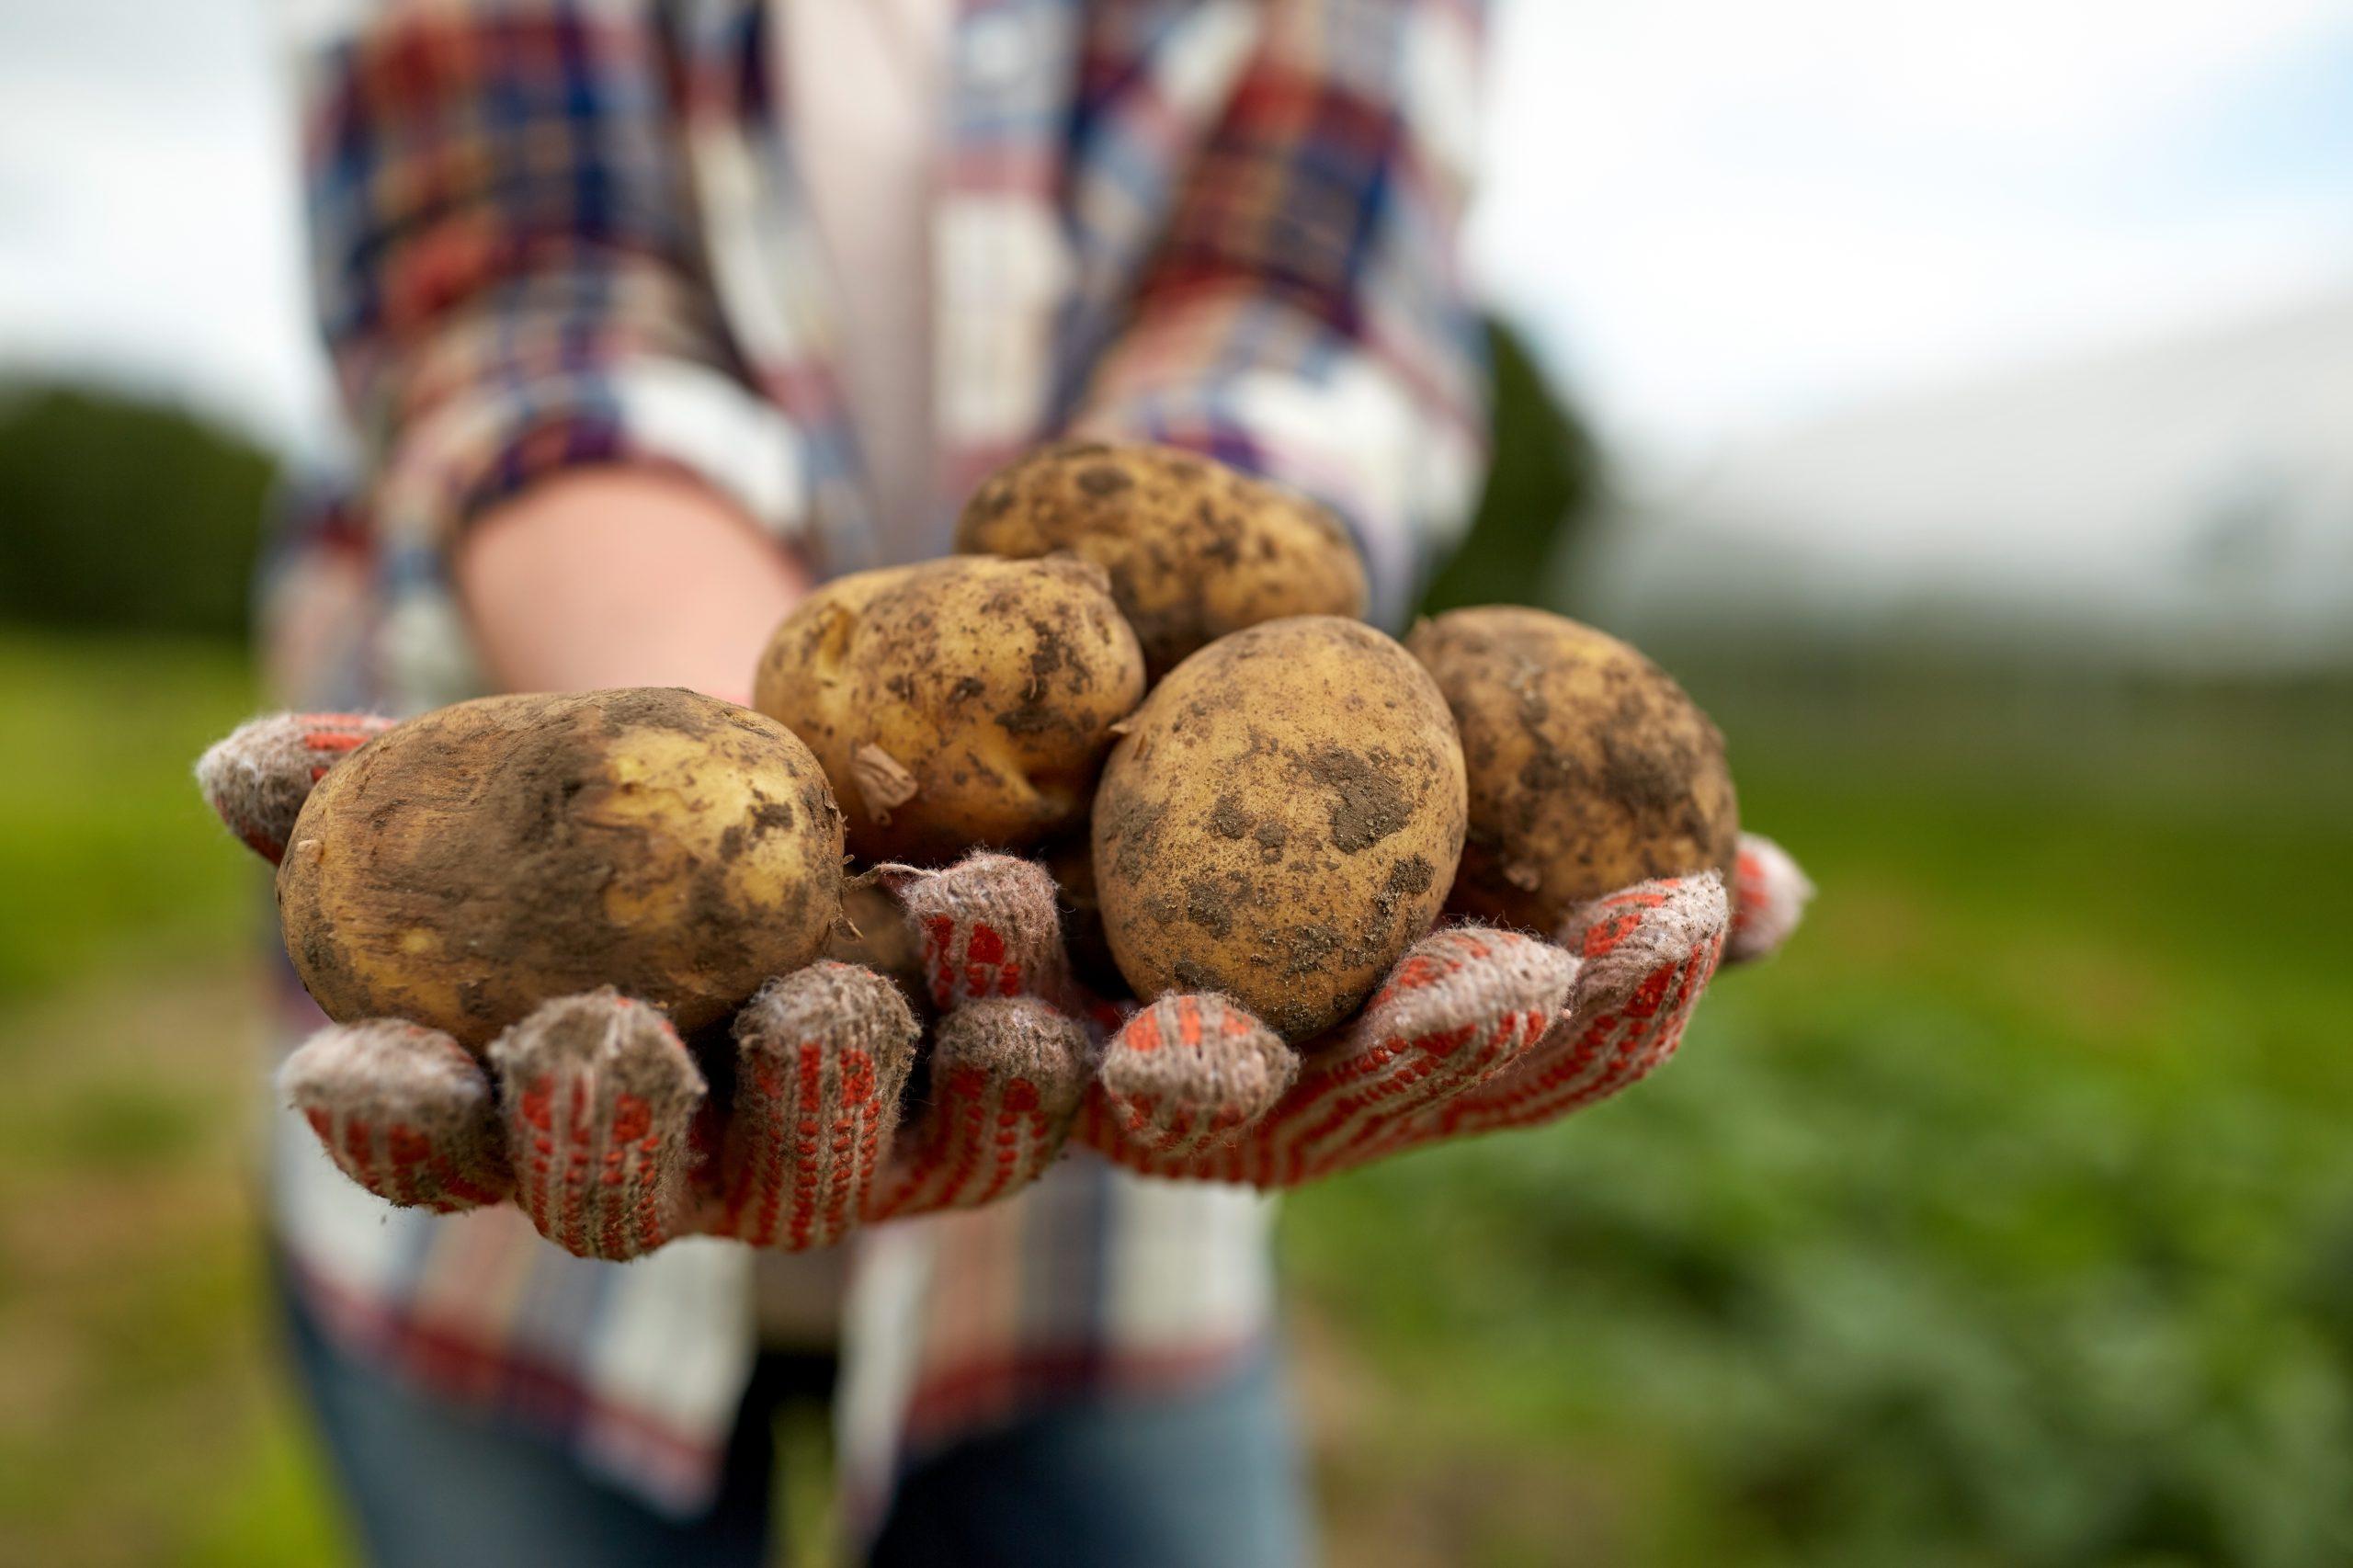 farmer hands holding potatoes at farm PYPDY7K